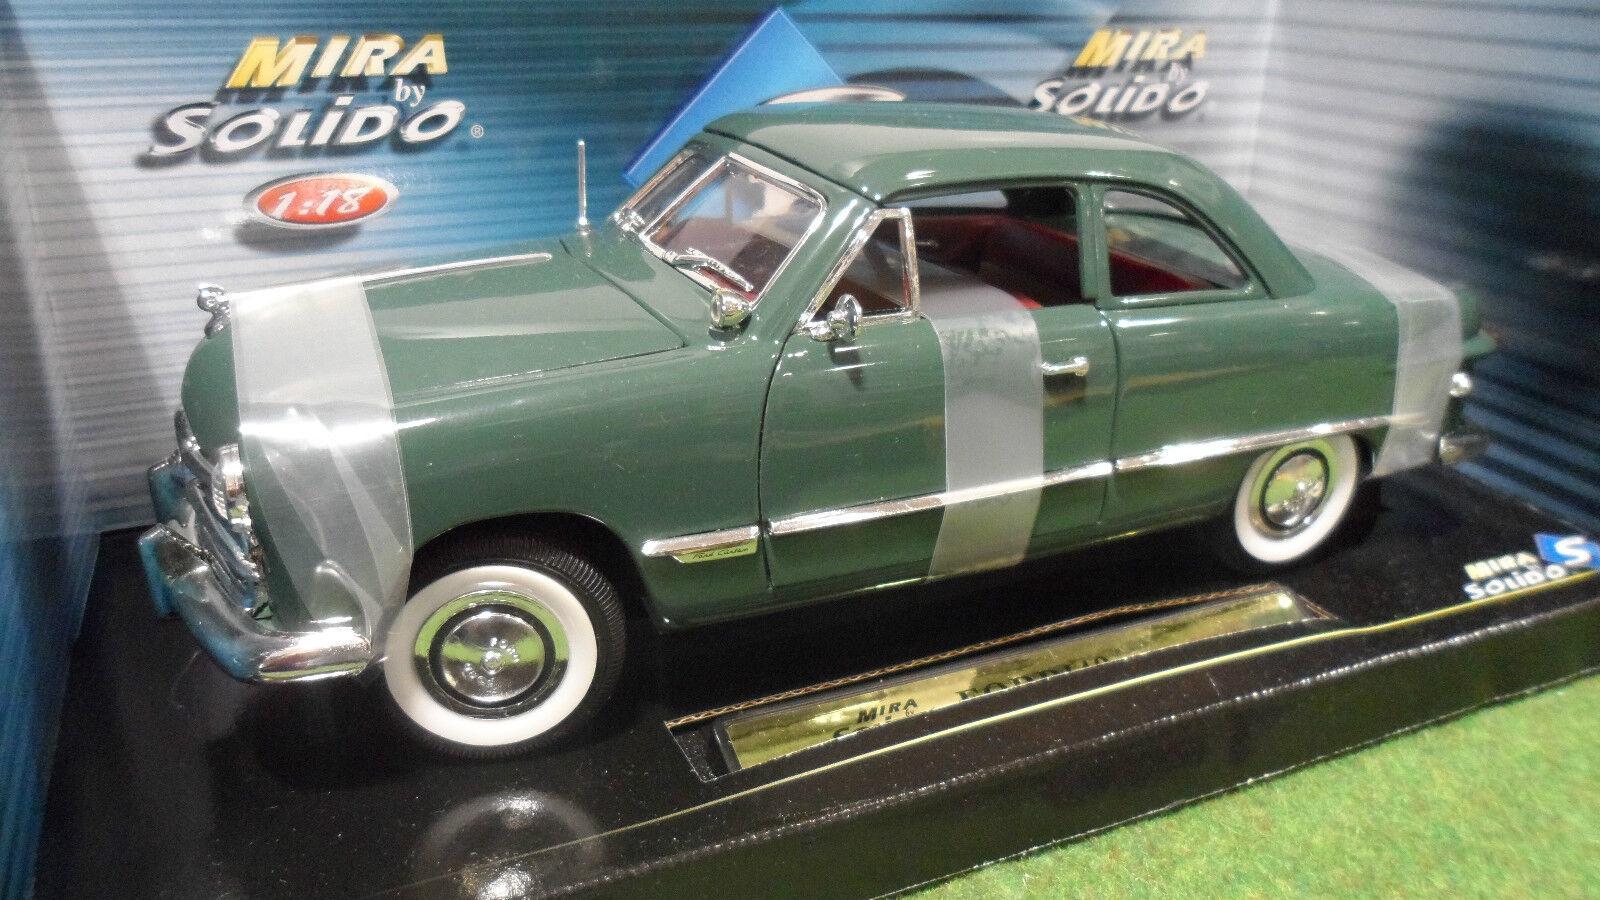 mejor vendido FORD Coupé 1949 verde au 1 18 de SOLIDO MIRA MIRA MIRA 8089 voiture miniature de collection  Envíos y devoluciones gratis.